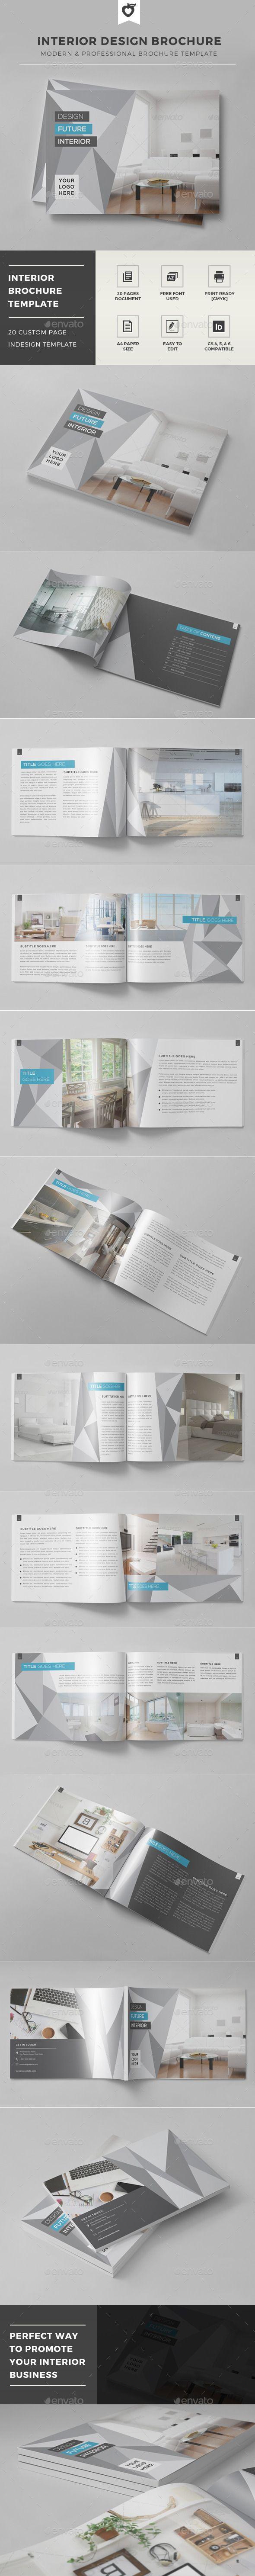 Interior Design Brochure Template #design Download: http://graphicriver.net/item/interior-design-brochure-template/12474610?ref=ksioks